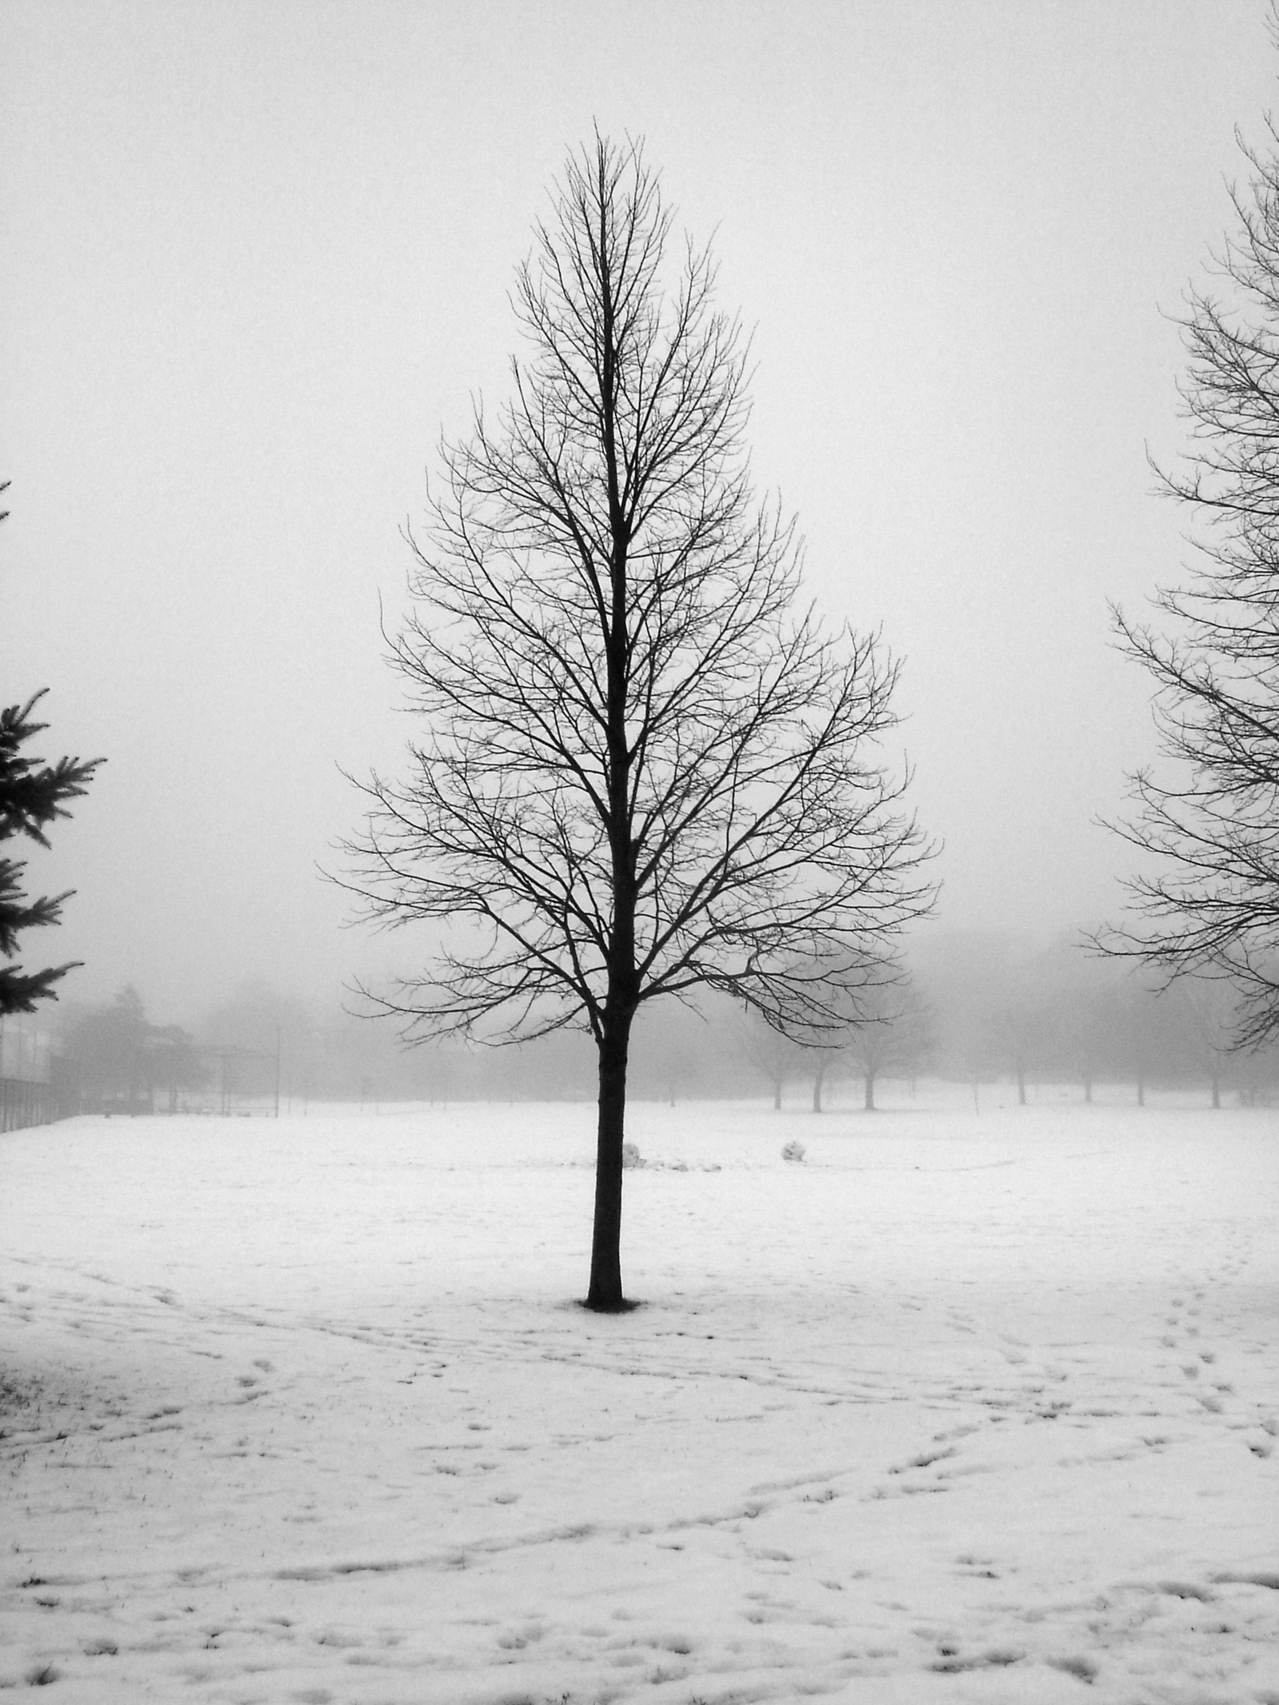 toronto-in-winter-1144905-1279x1705